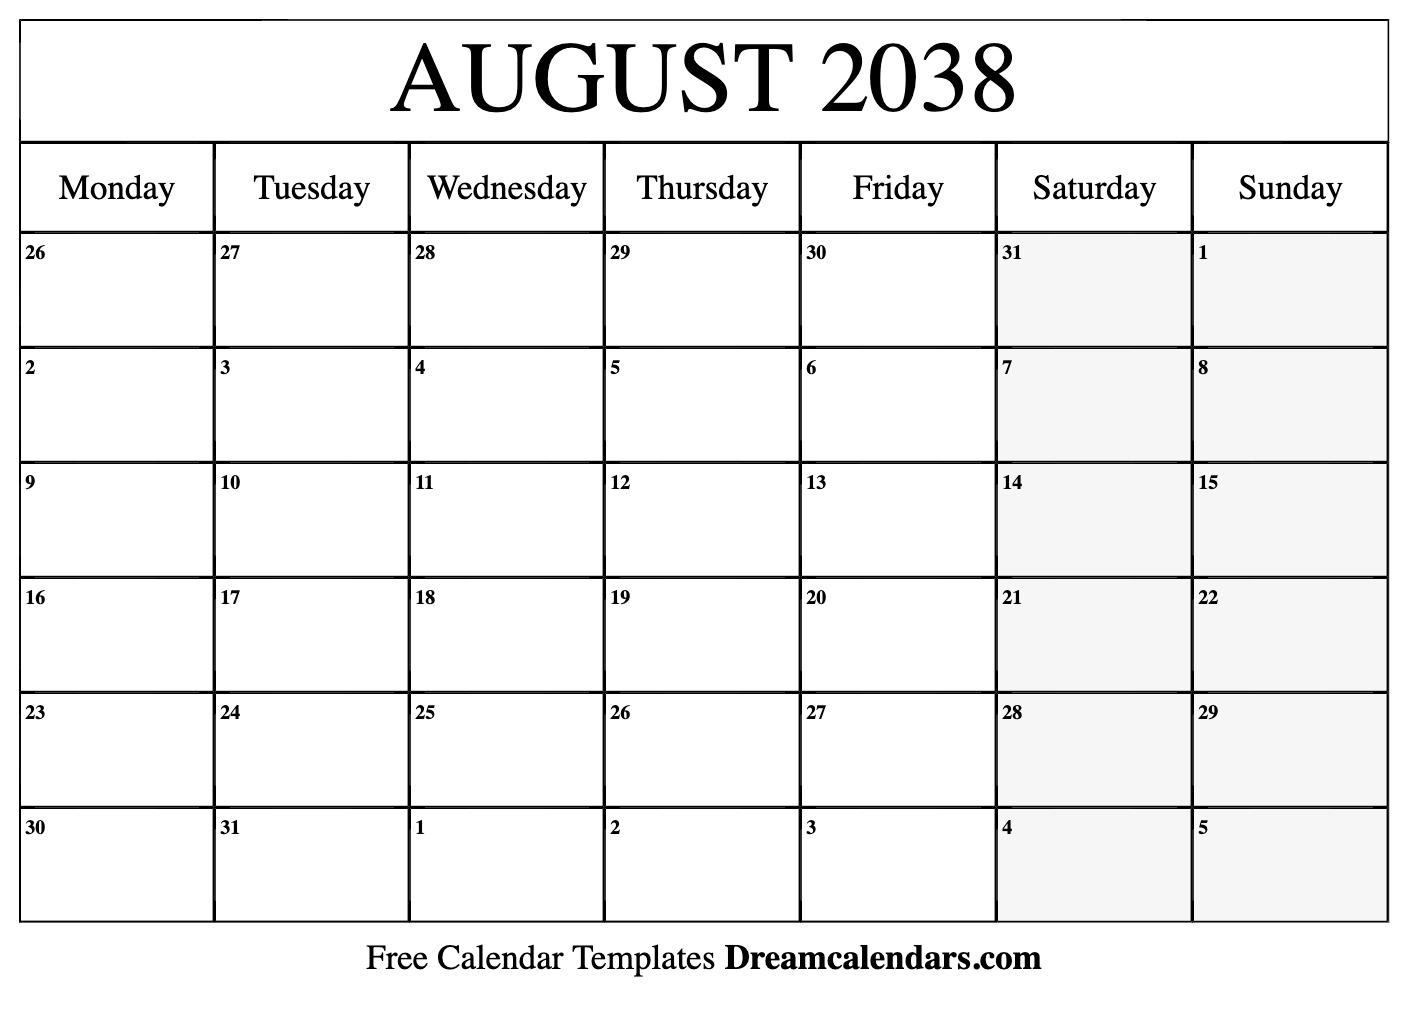 Printable Sunrise Sunset Times 2021 | Printable Calendar With Printable Sunrise/Sunset Tables For 2021